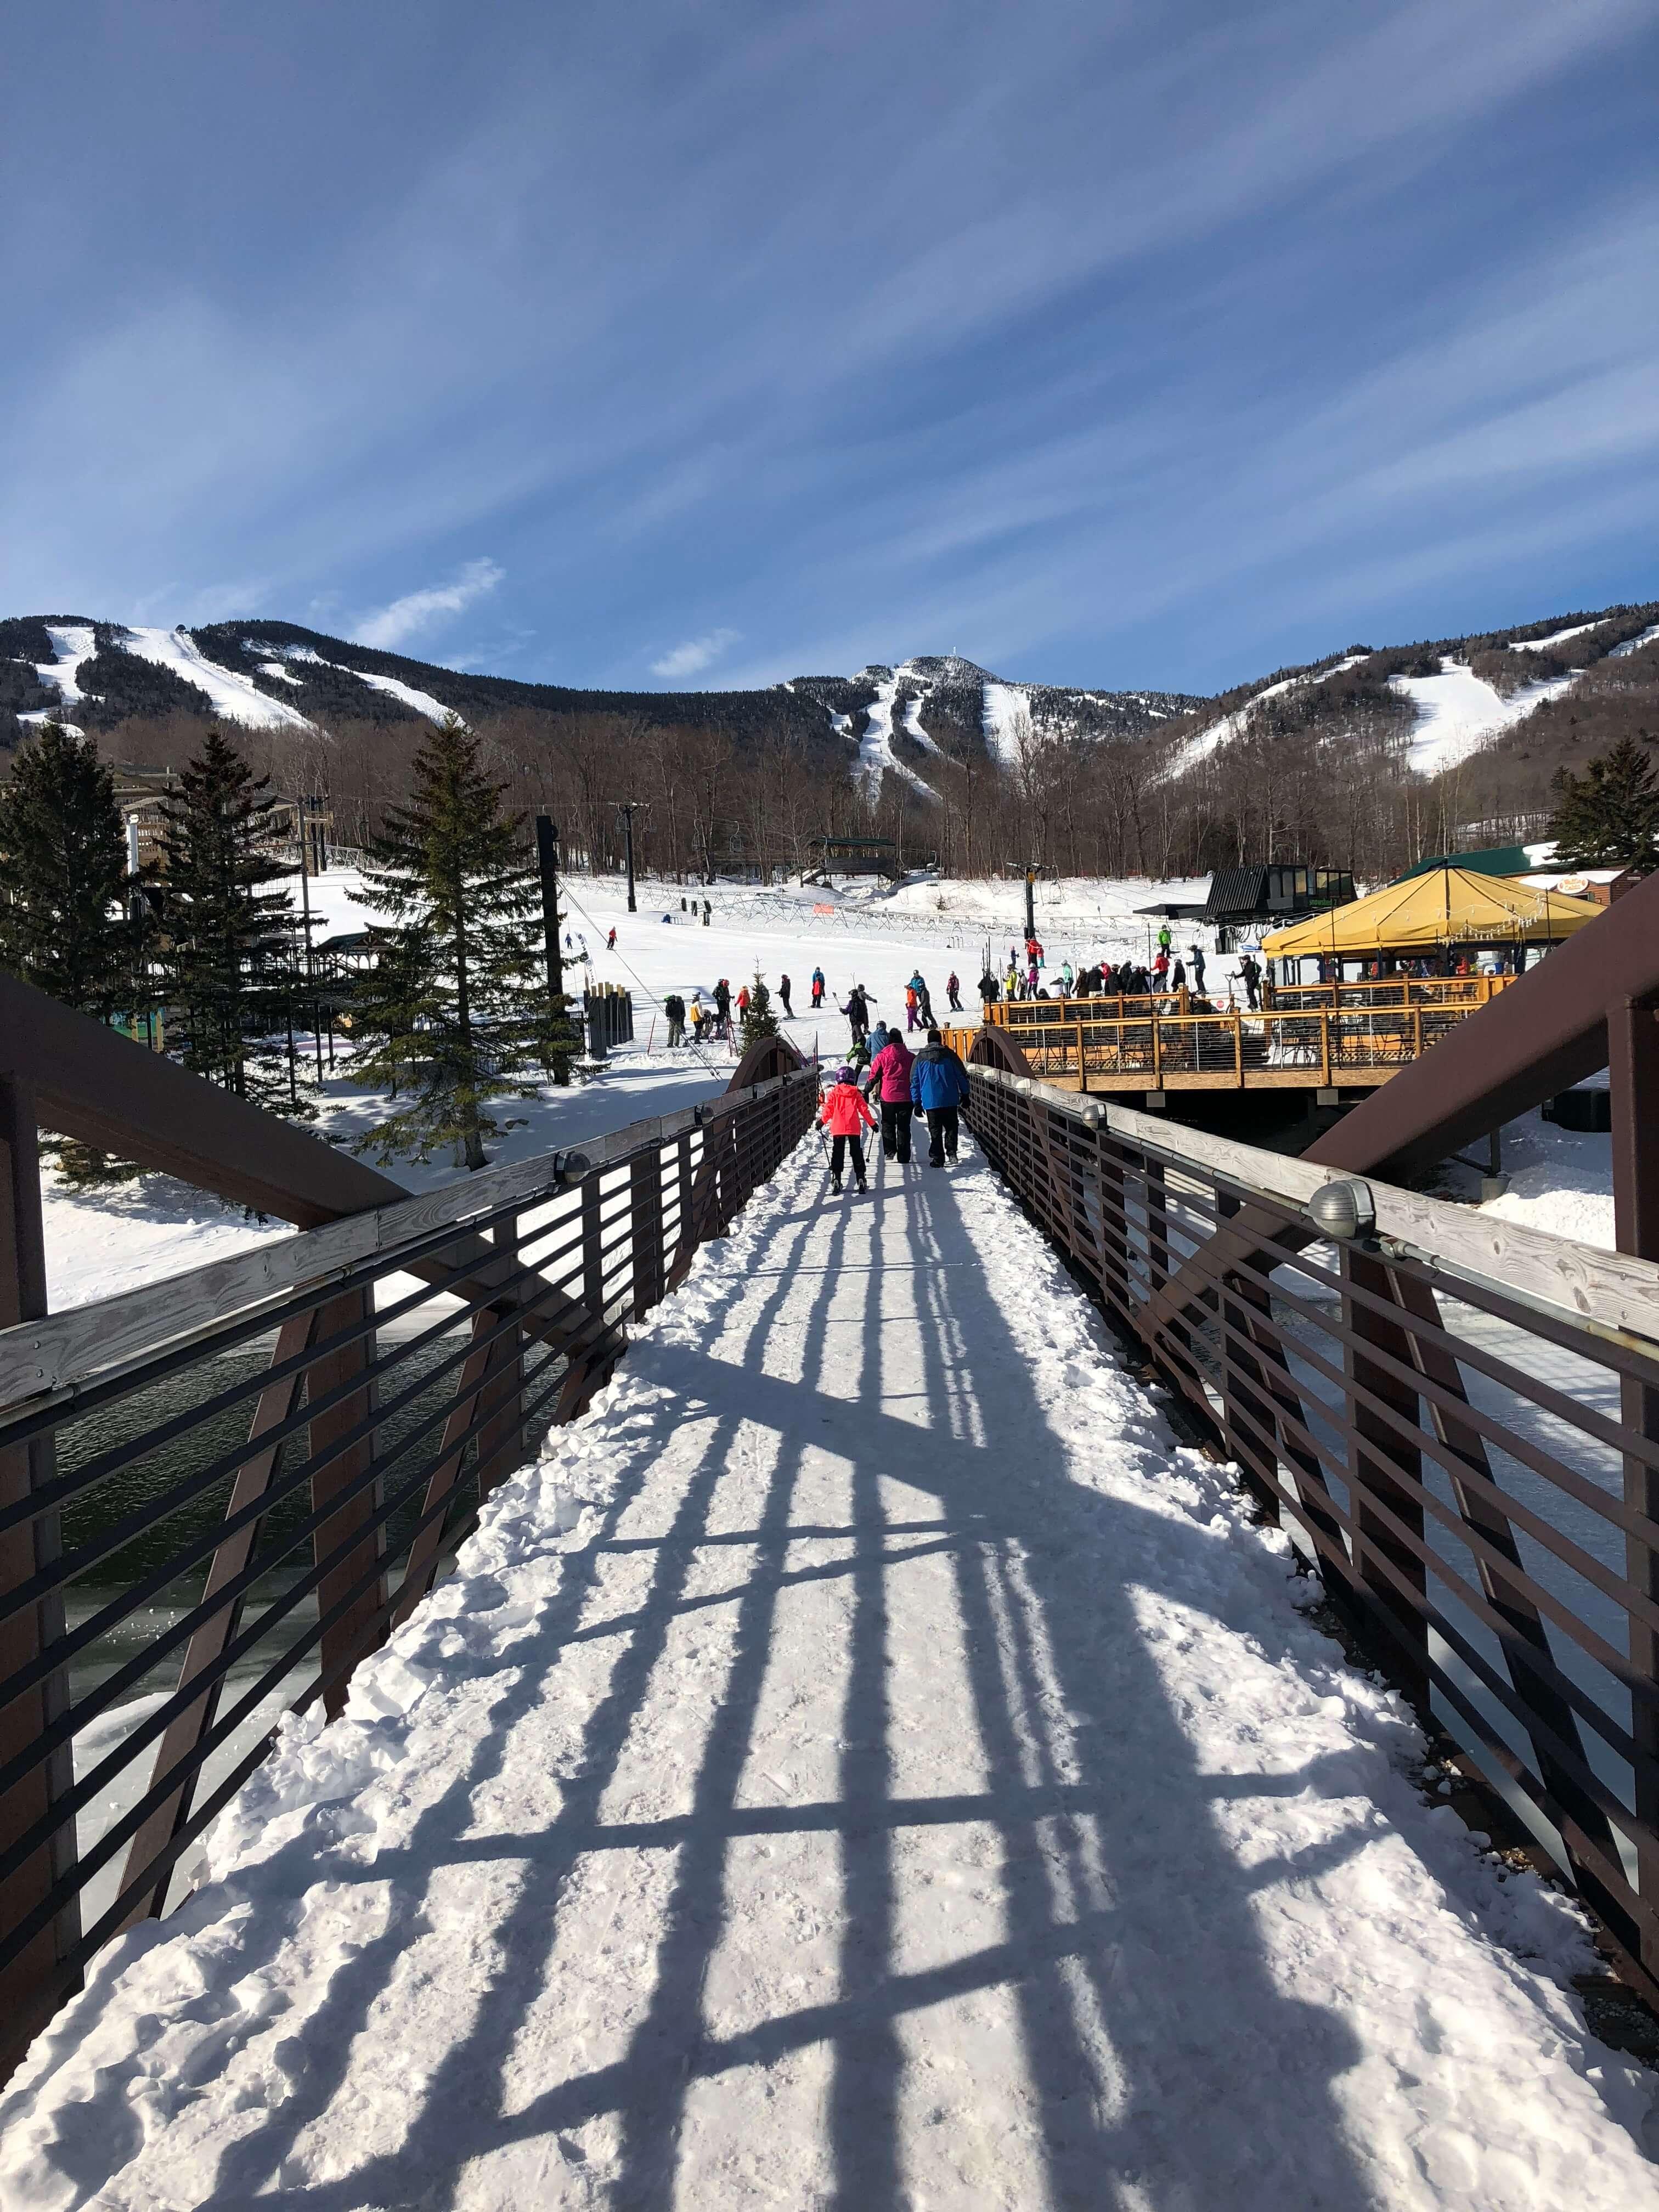 Killington Resort bridge learning to ski as an adult